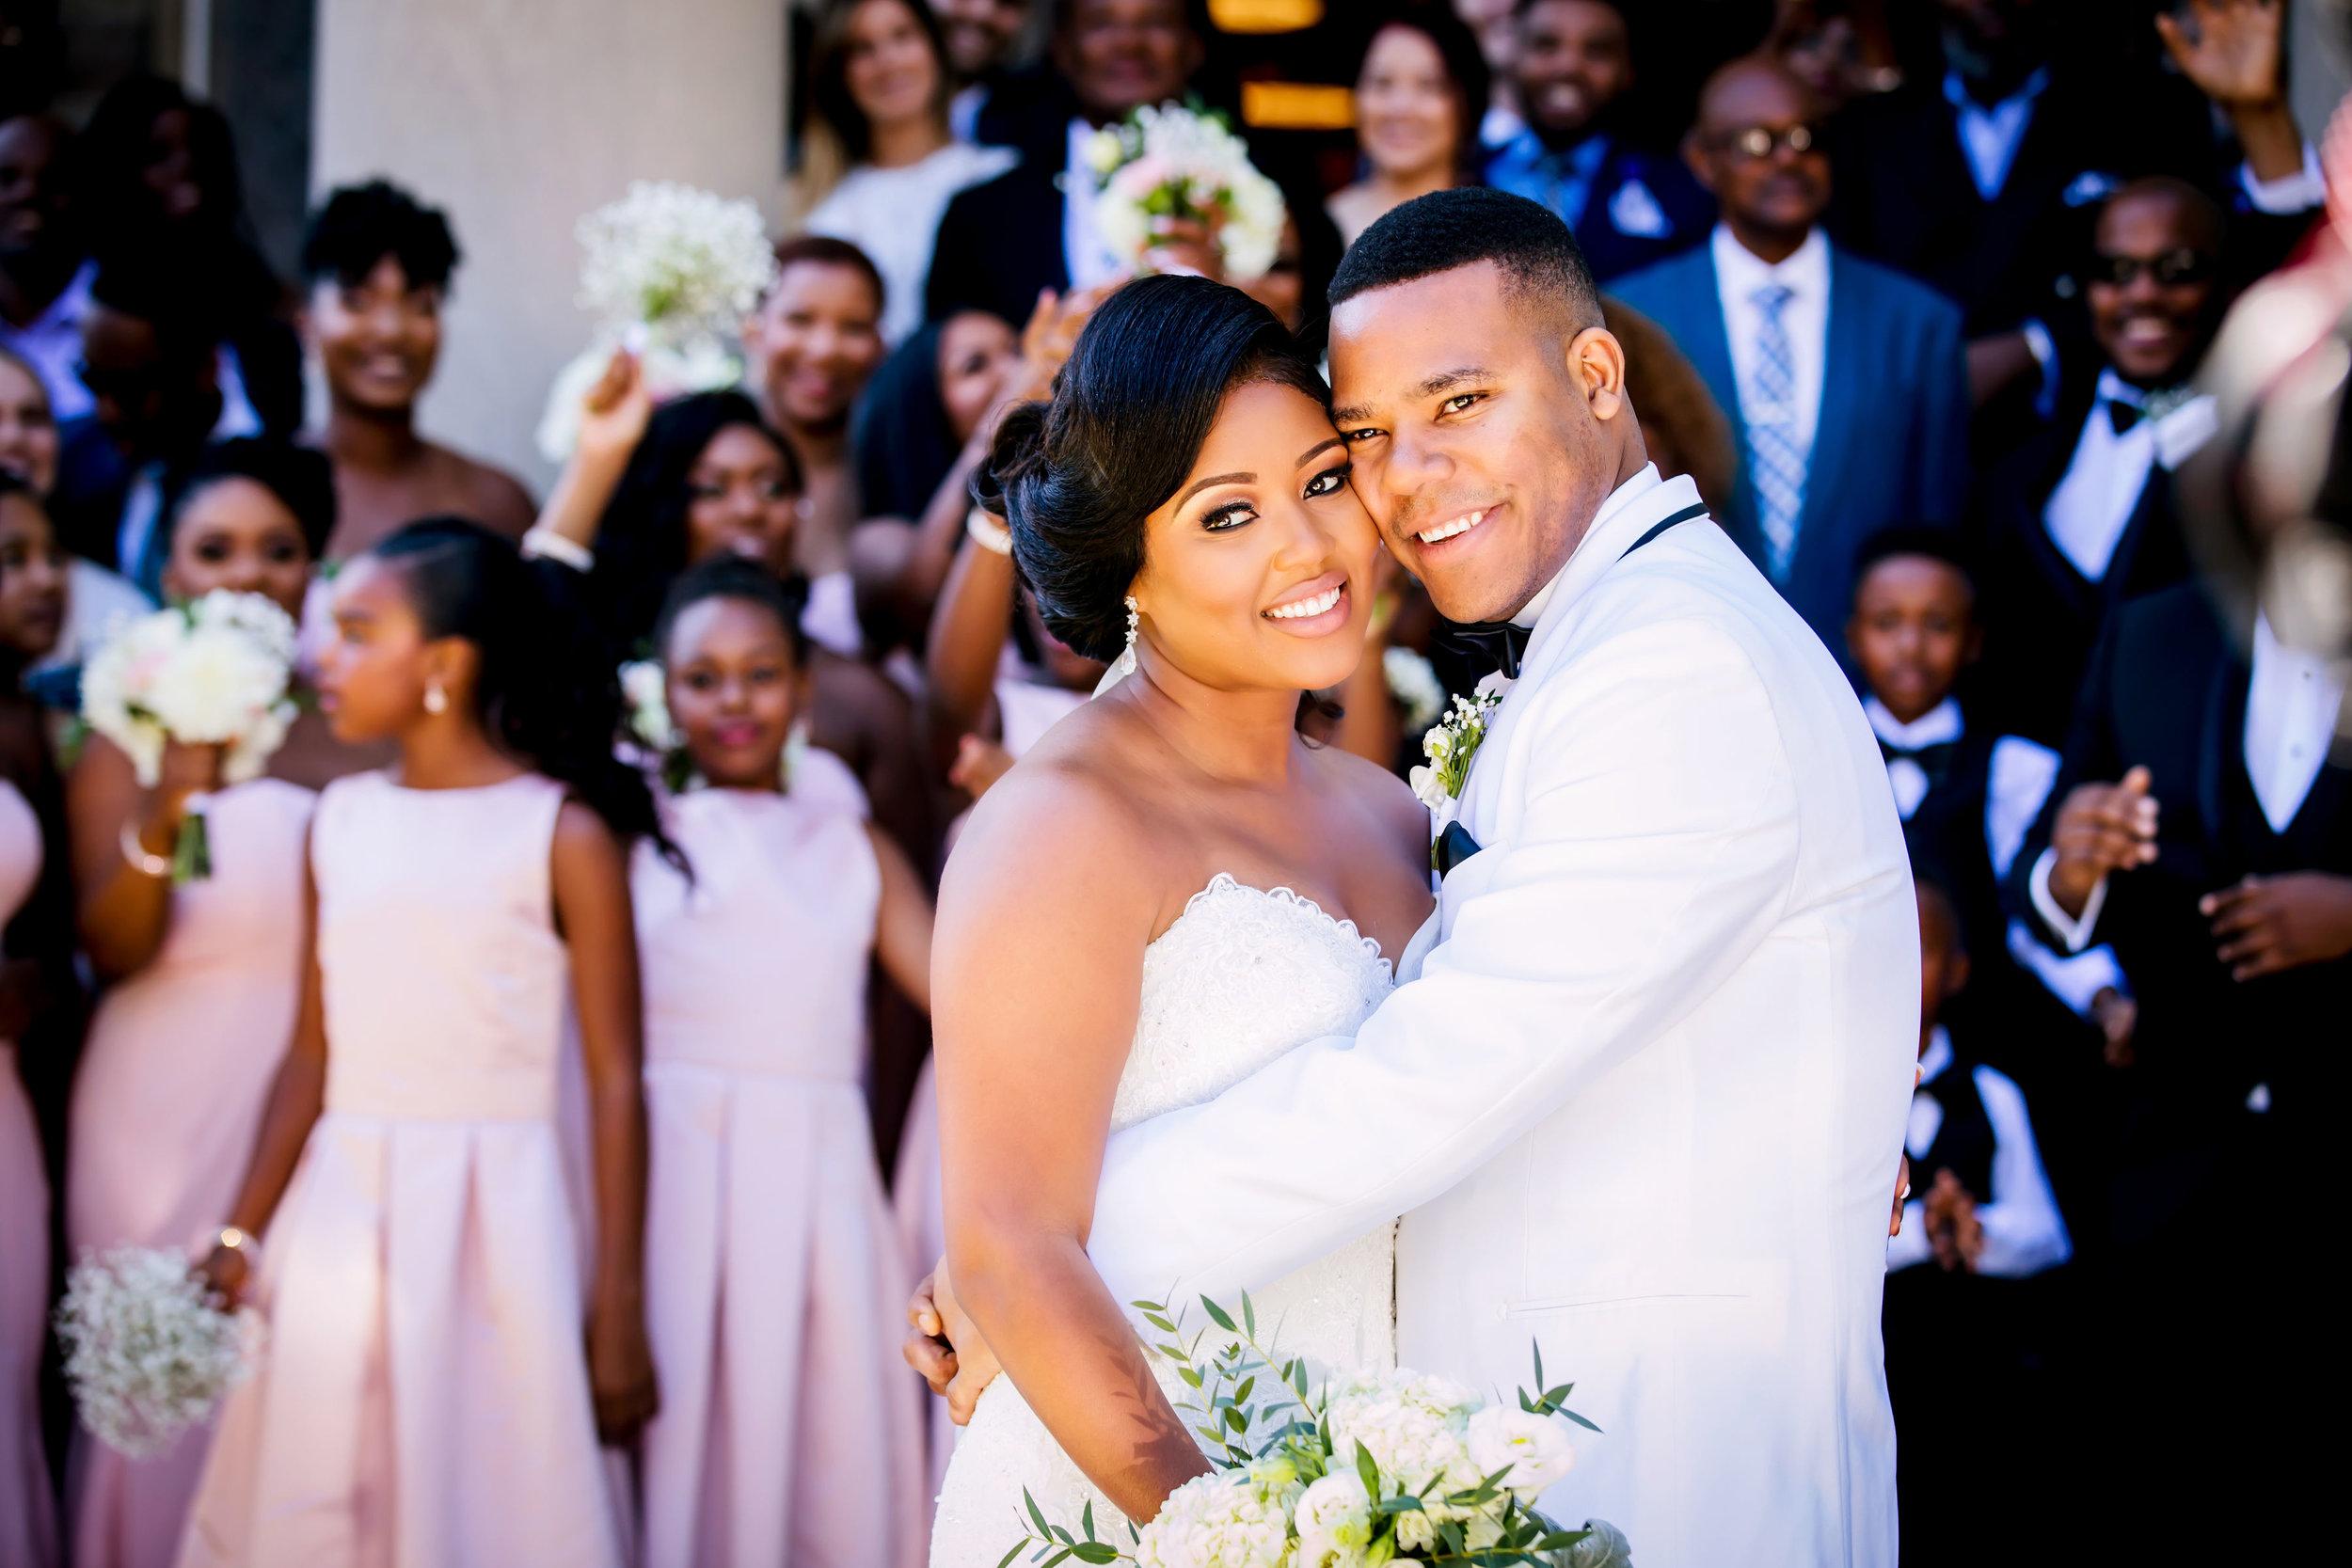 Karimah_Gheddai_Photography_Catholic_Wedding_Alexander_Muir_Gardens_Paradise_Banquet_Hall_10